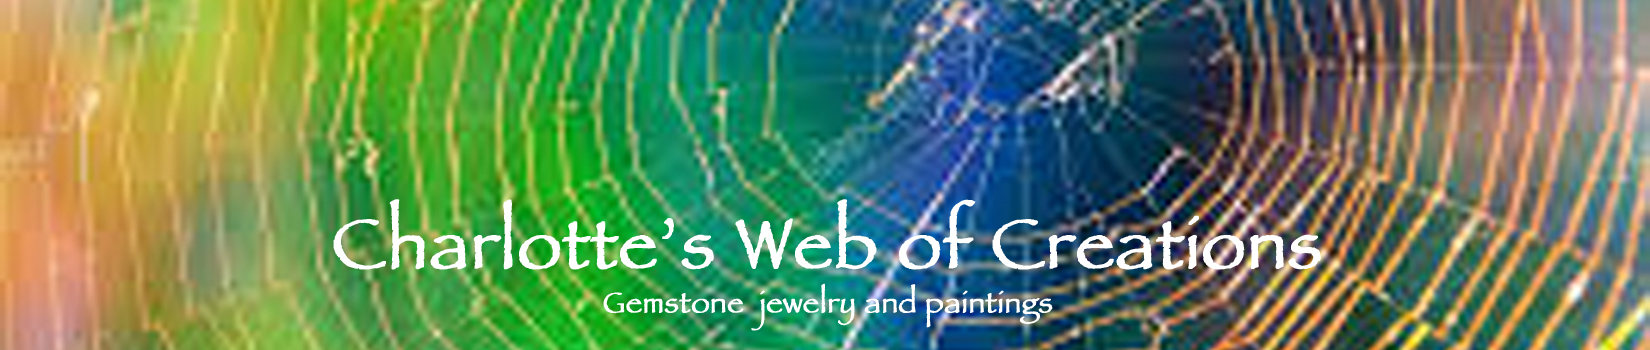 Charlottes Web of Creations